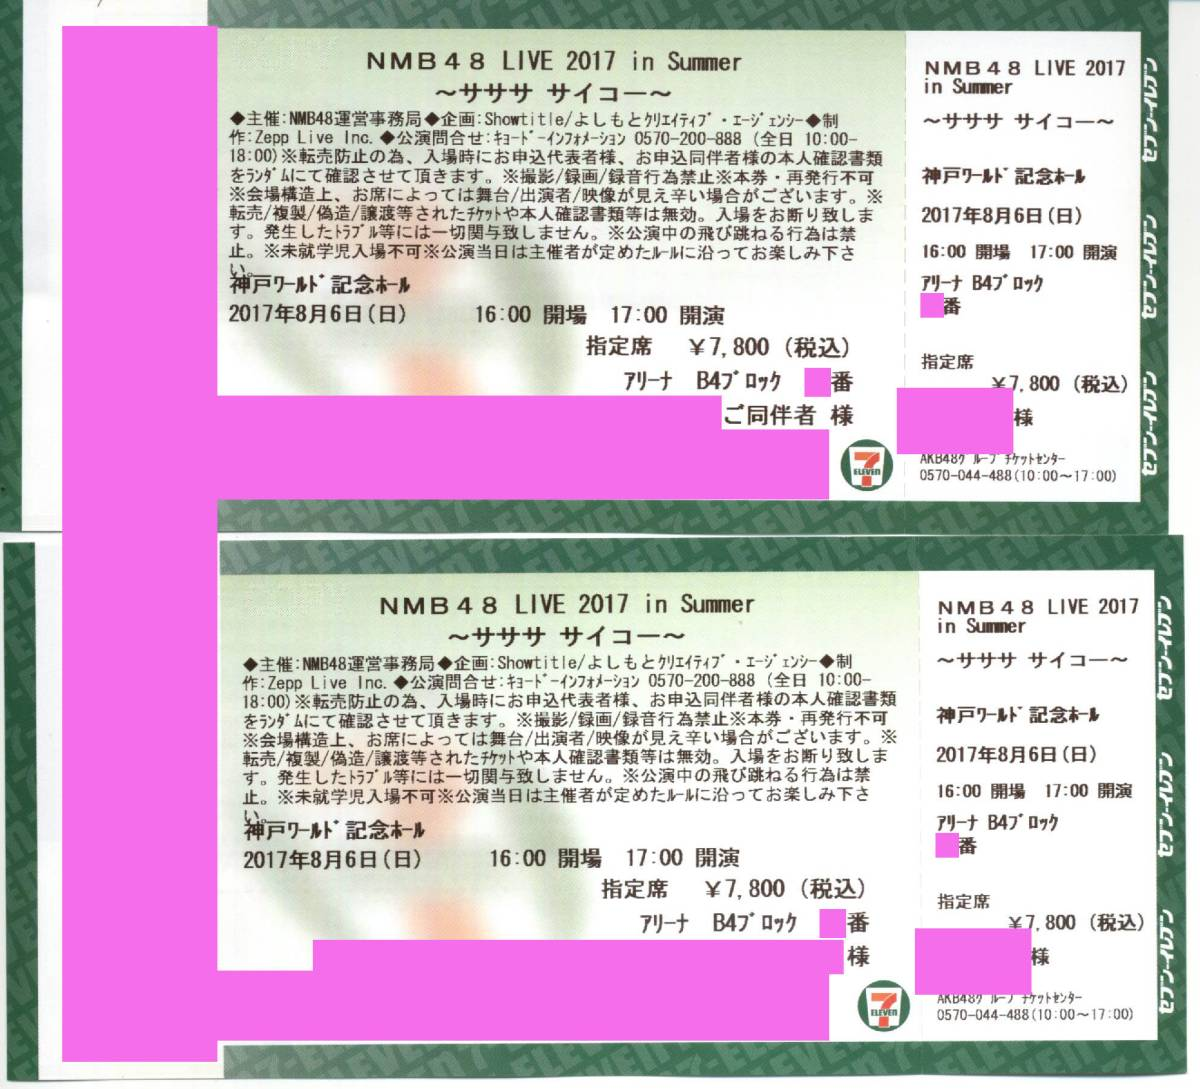 NMB48 同伴入場 8/6 NMB48 Mobile会員枠 兵庫 神戸ワールド記念ホール アリーナB4-20~40番1枚